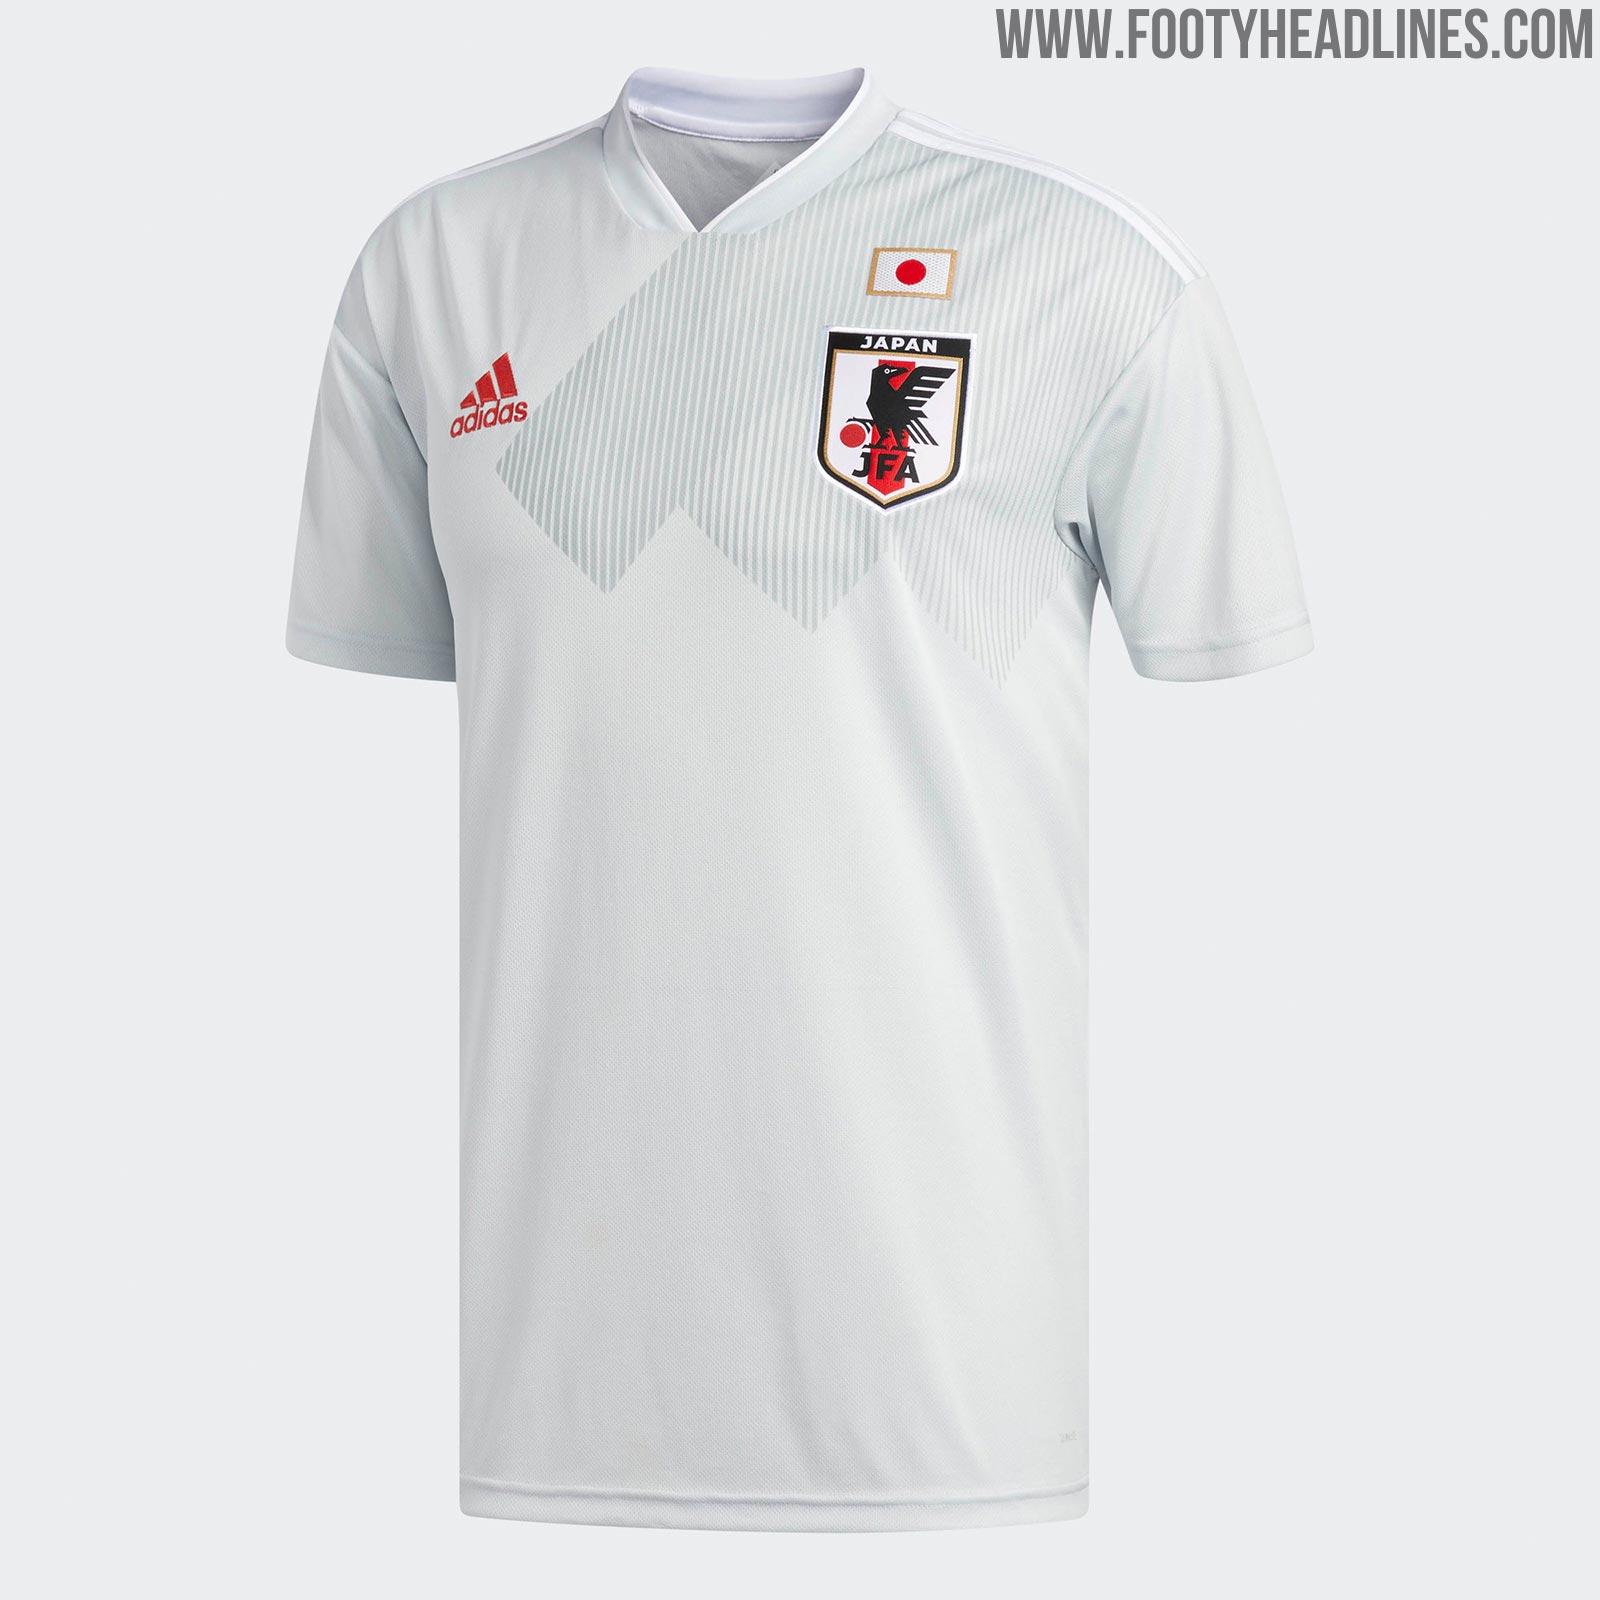 Japan 2018 World Cup Away Kit Released Footy Headlines